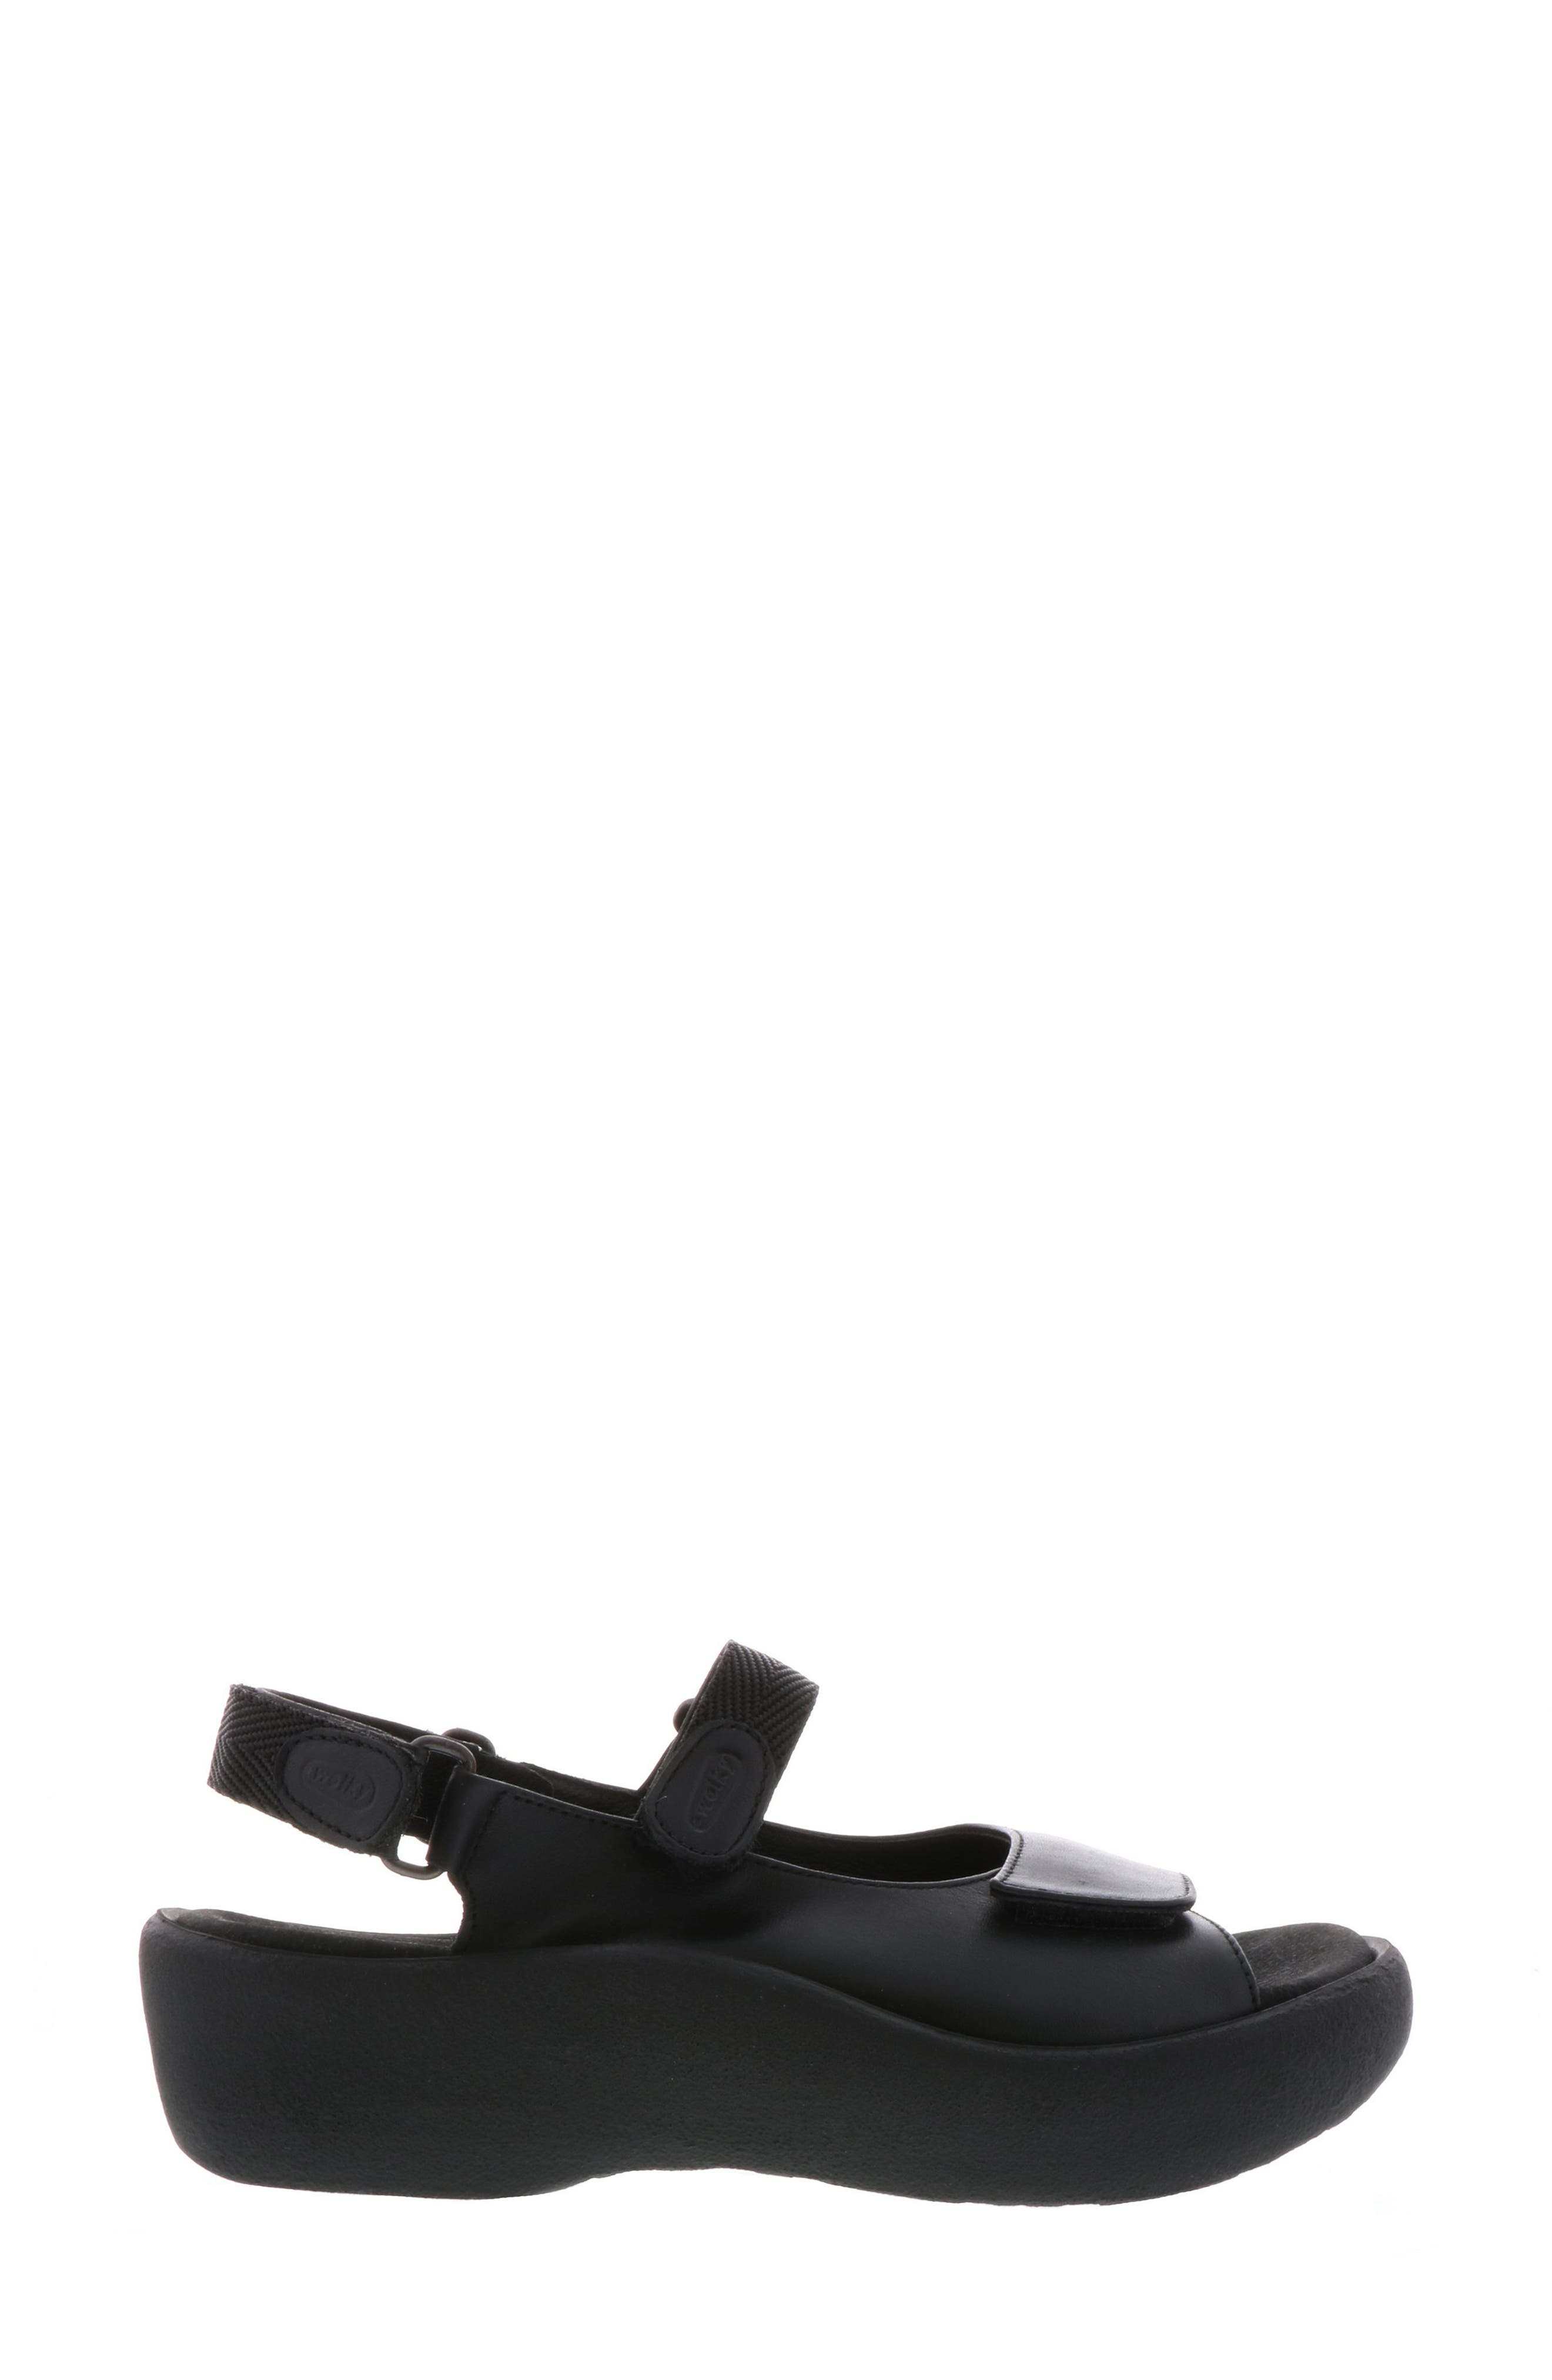 WOLKY, Jewel Sport Sandal, Alternate thumbnail 3, color, BLACK/ BLACK